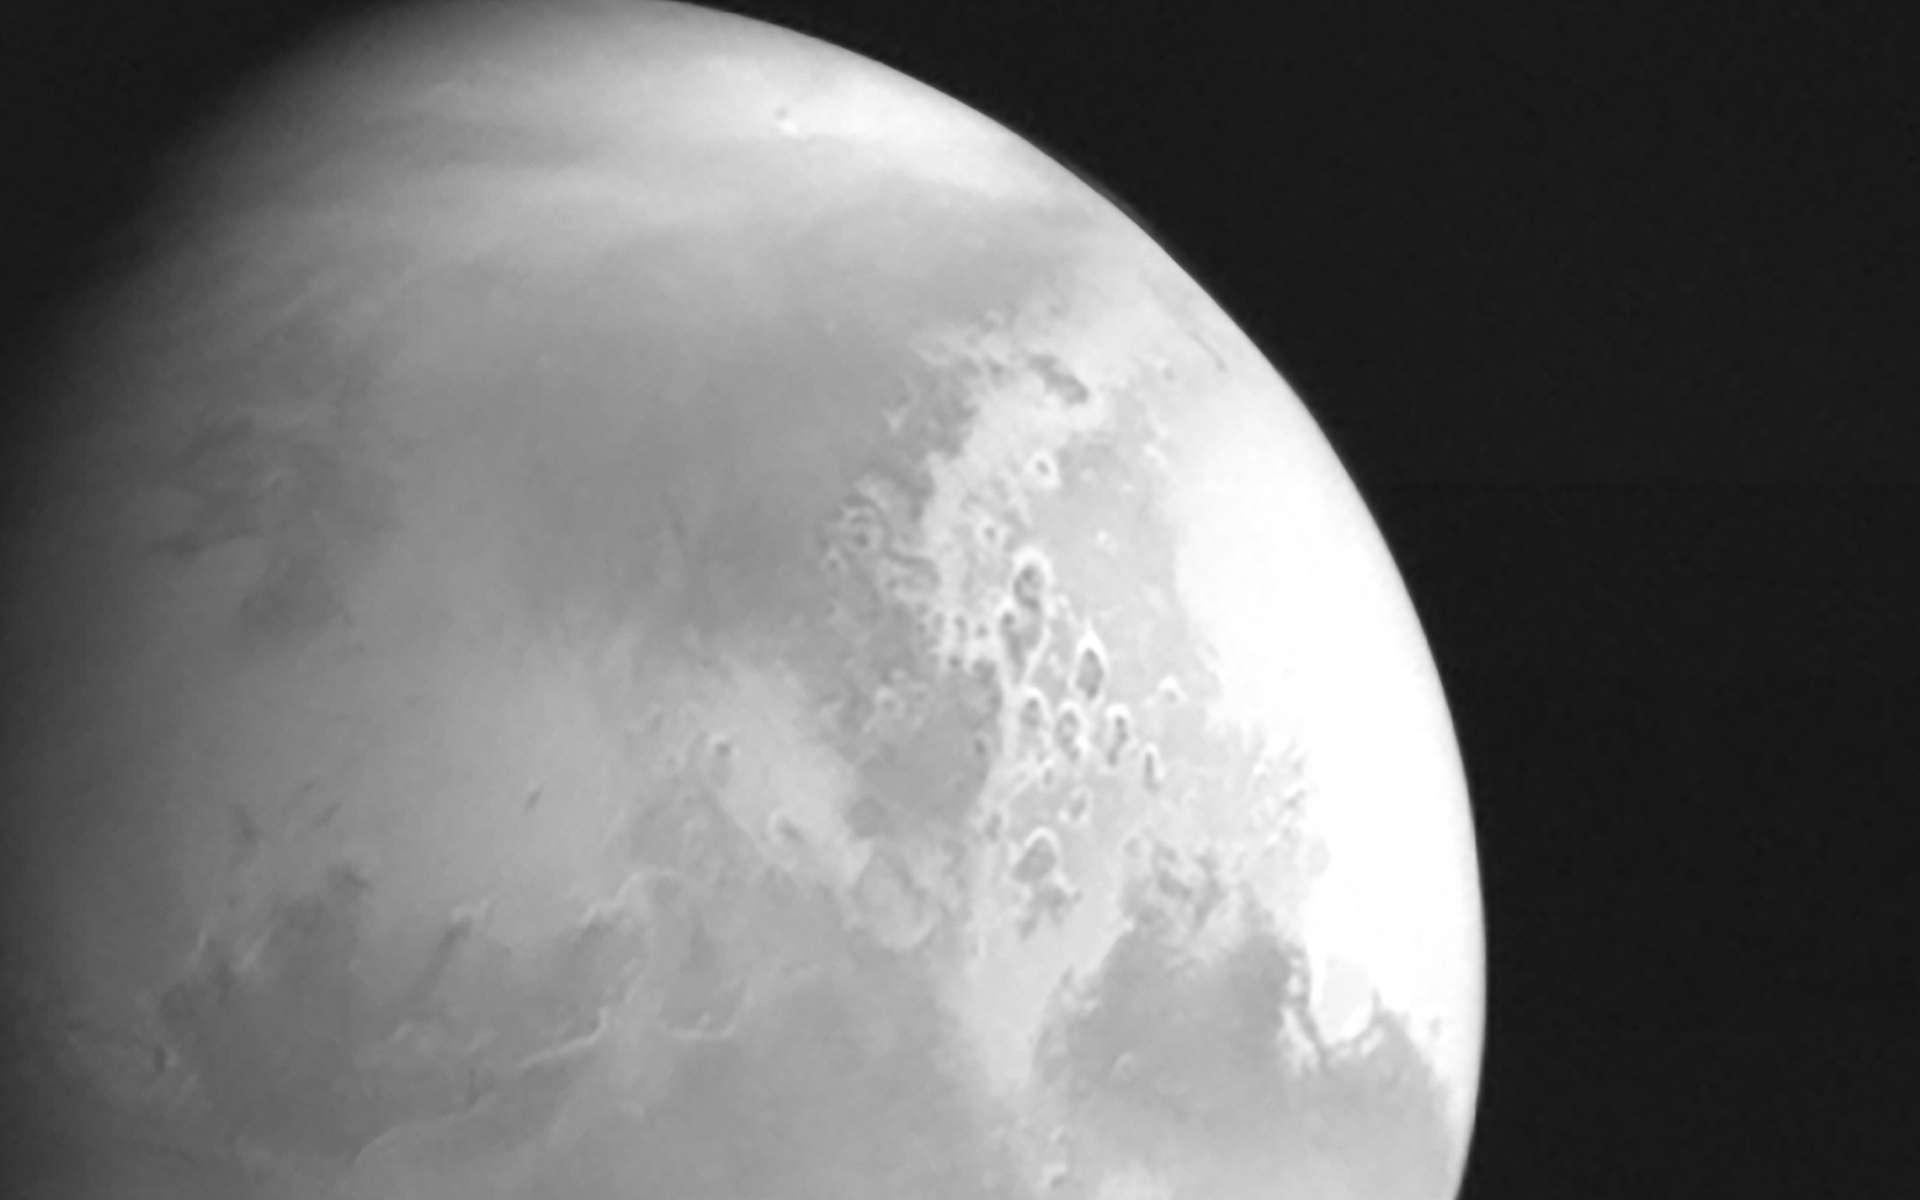 Mars en vue ! La sonde chinoise Tianwen-1 envoie sa première photo - Futura